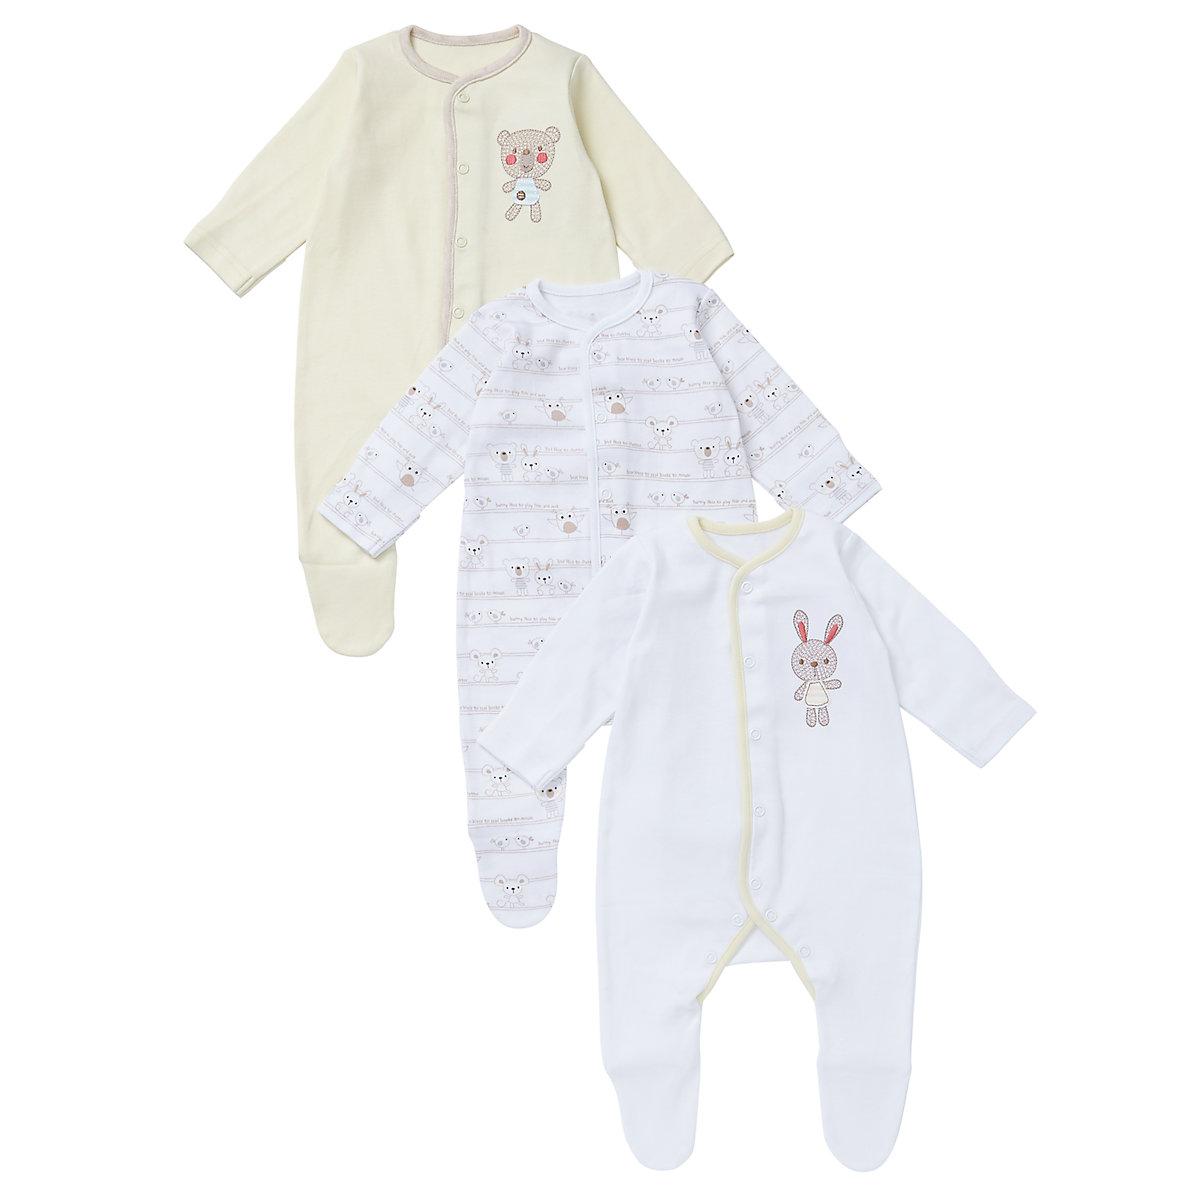 Mothercare Newborn Sleepsuits- 3 Pack